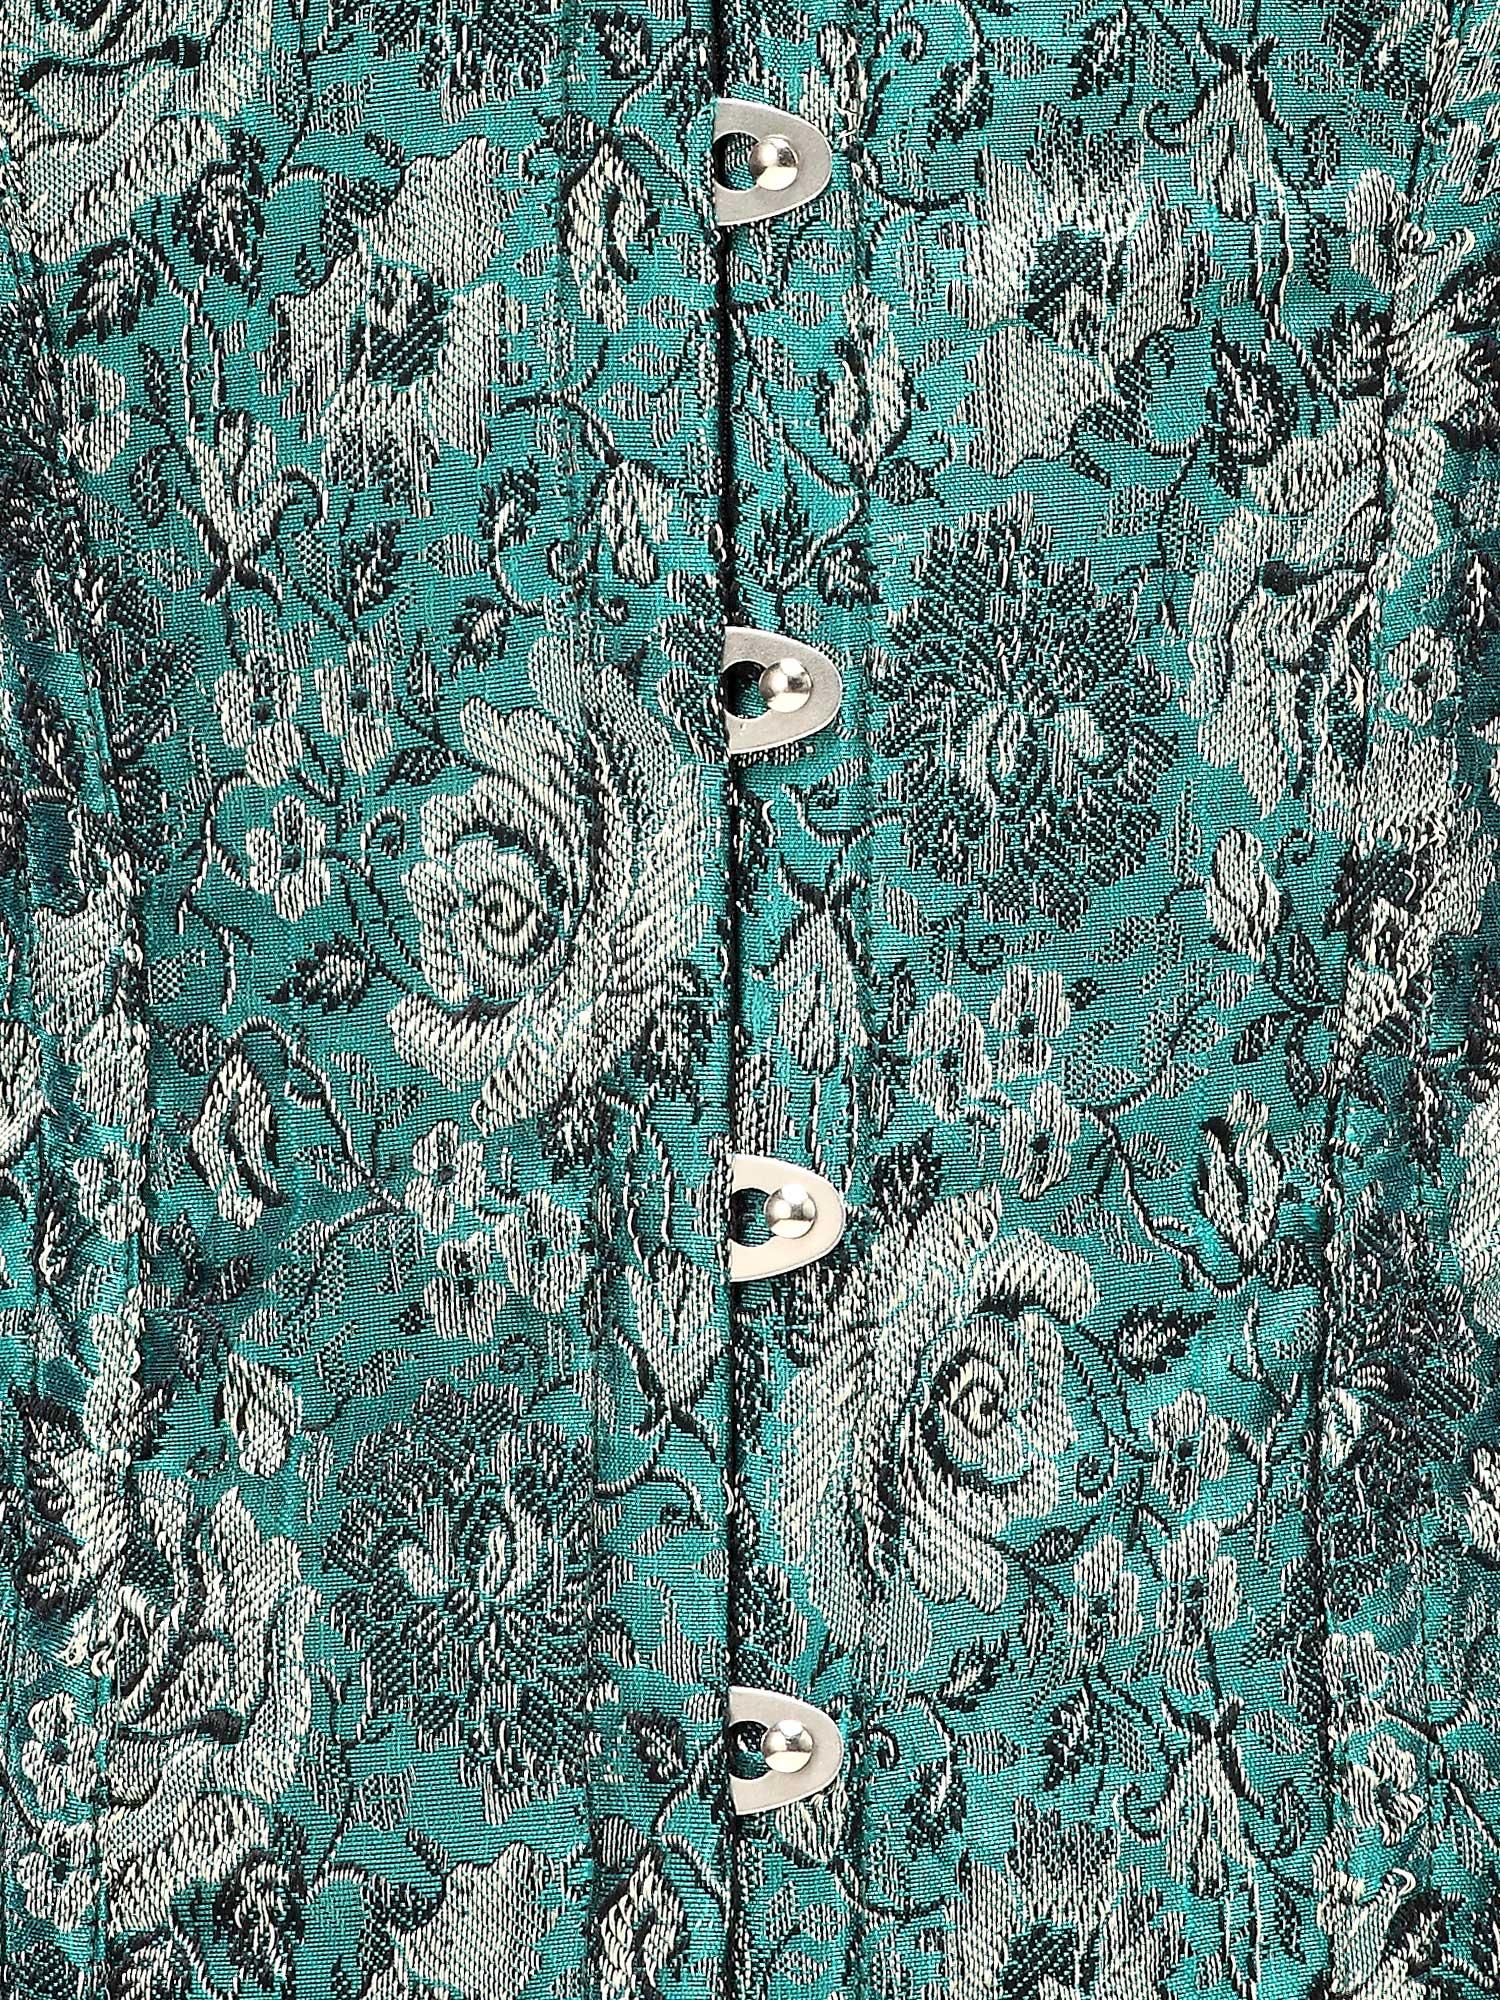 green_floral_jacquard_fabric_steel_boning_corset_waist_cincher_bustier_bustiers_and_corsets_2.jpg